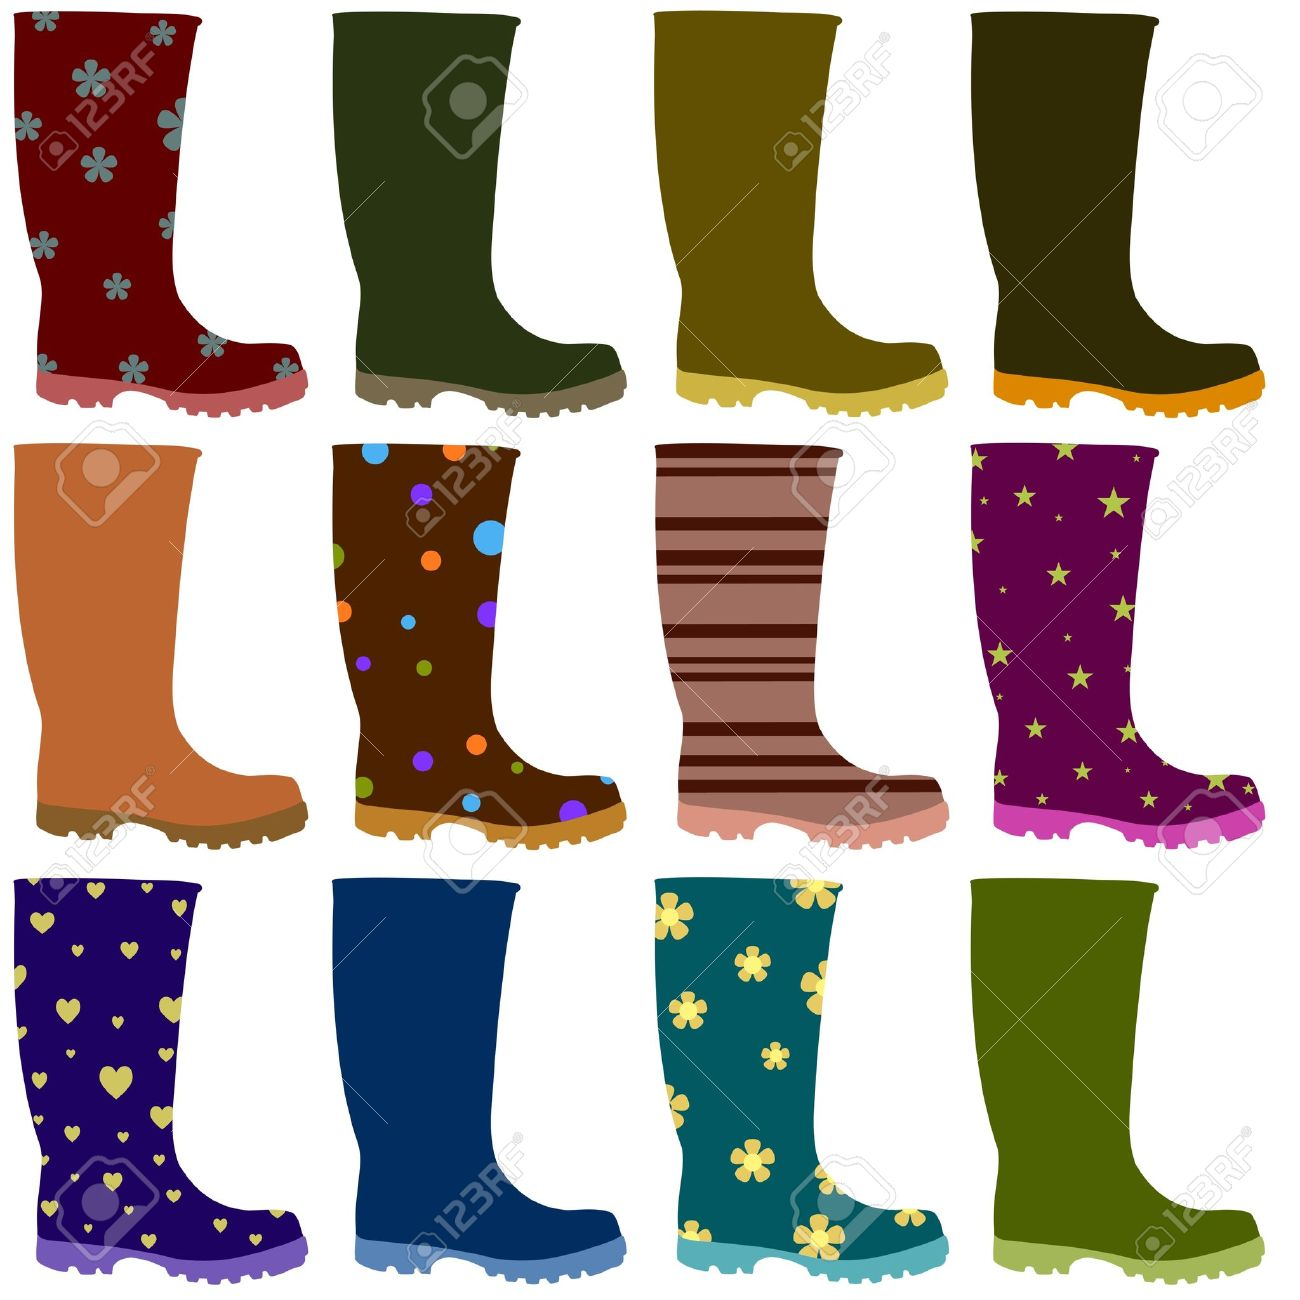 wellington boot: Illustration of 12 Wellington boots Stock Photo